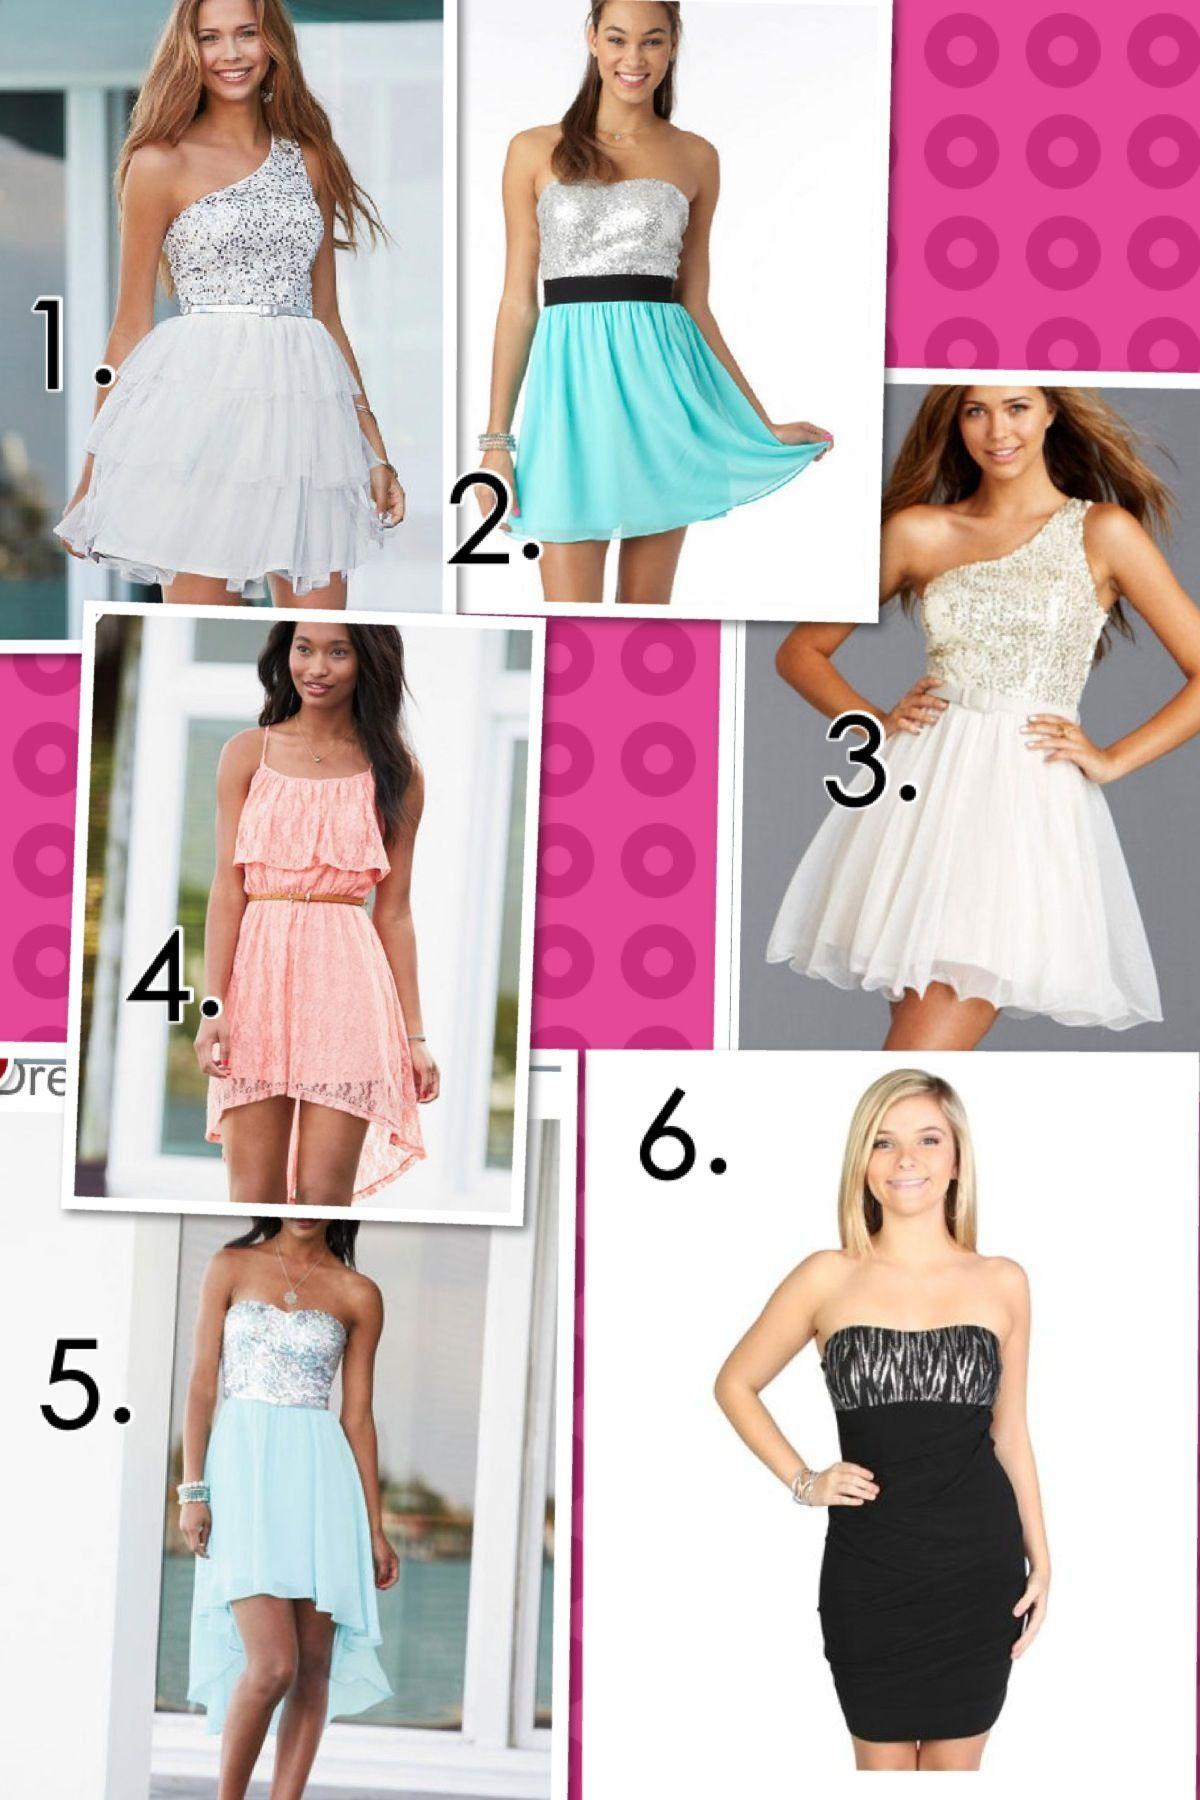 Ffafccdcg pixels dresses